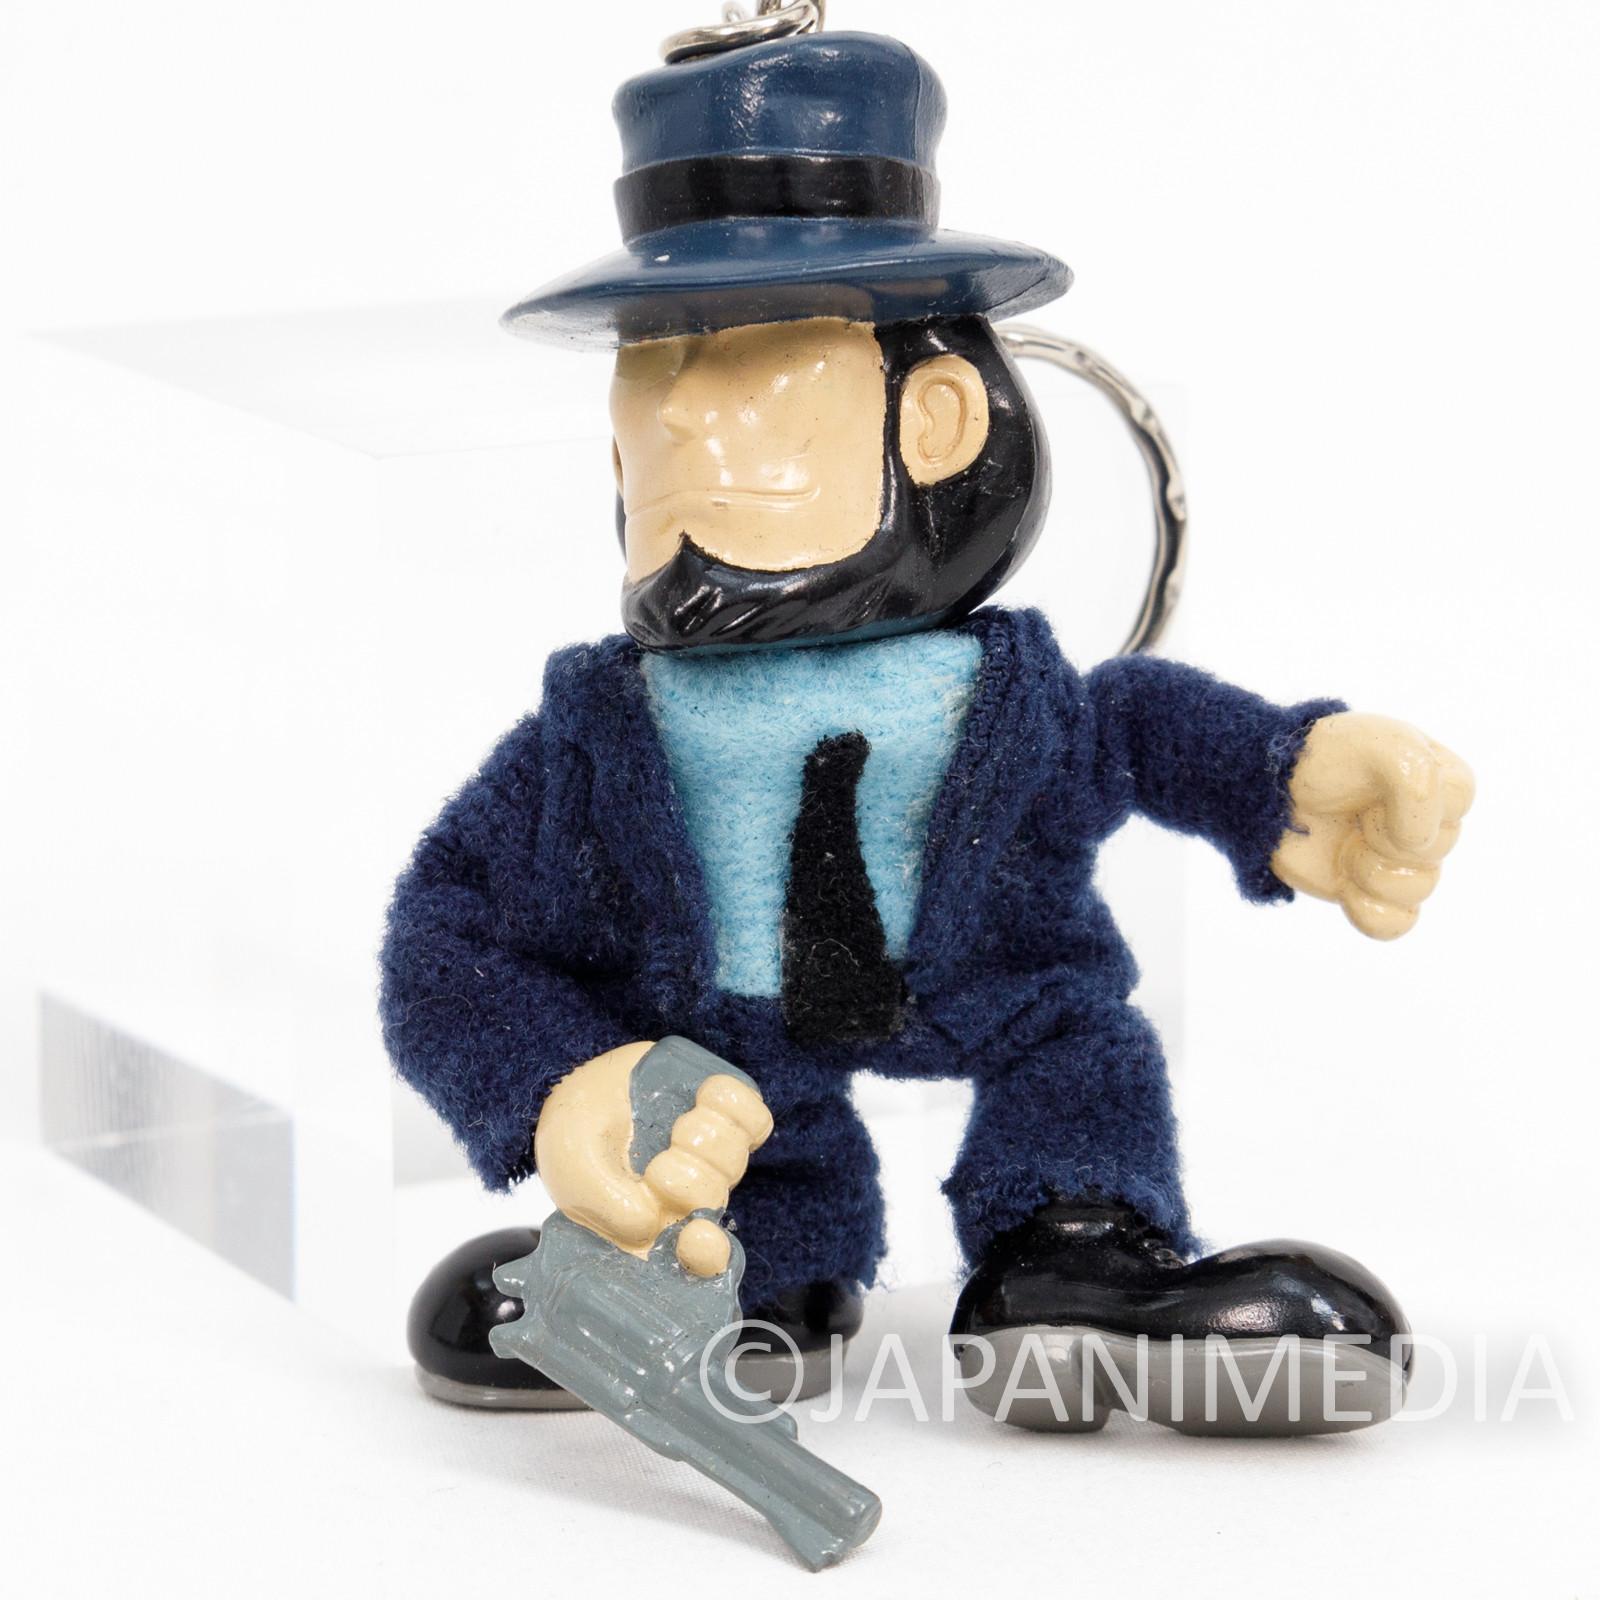 Lupin the Third (3rd) Jigen Figure Doll Keychain Banpresto JAPAN ANIME MANGA